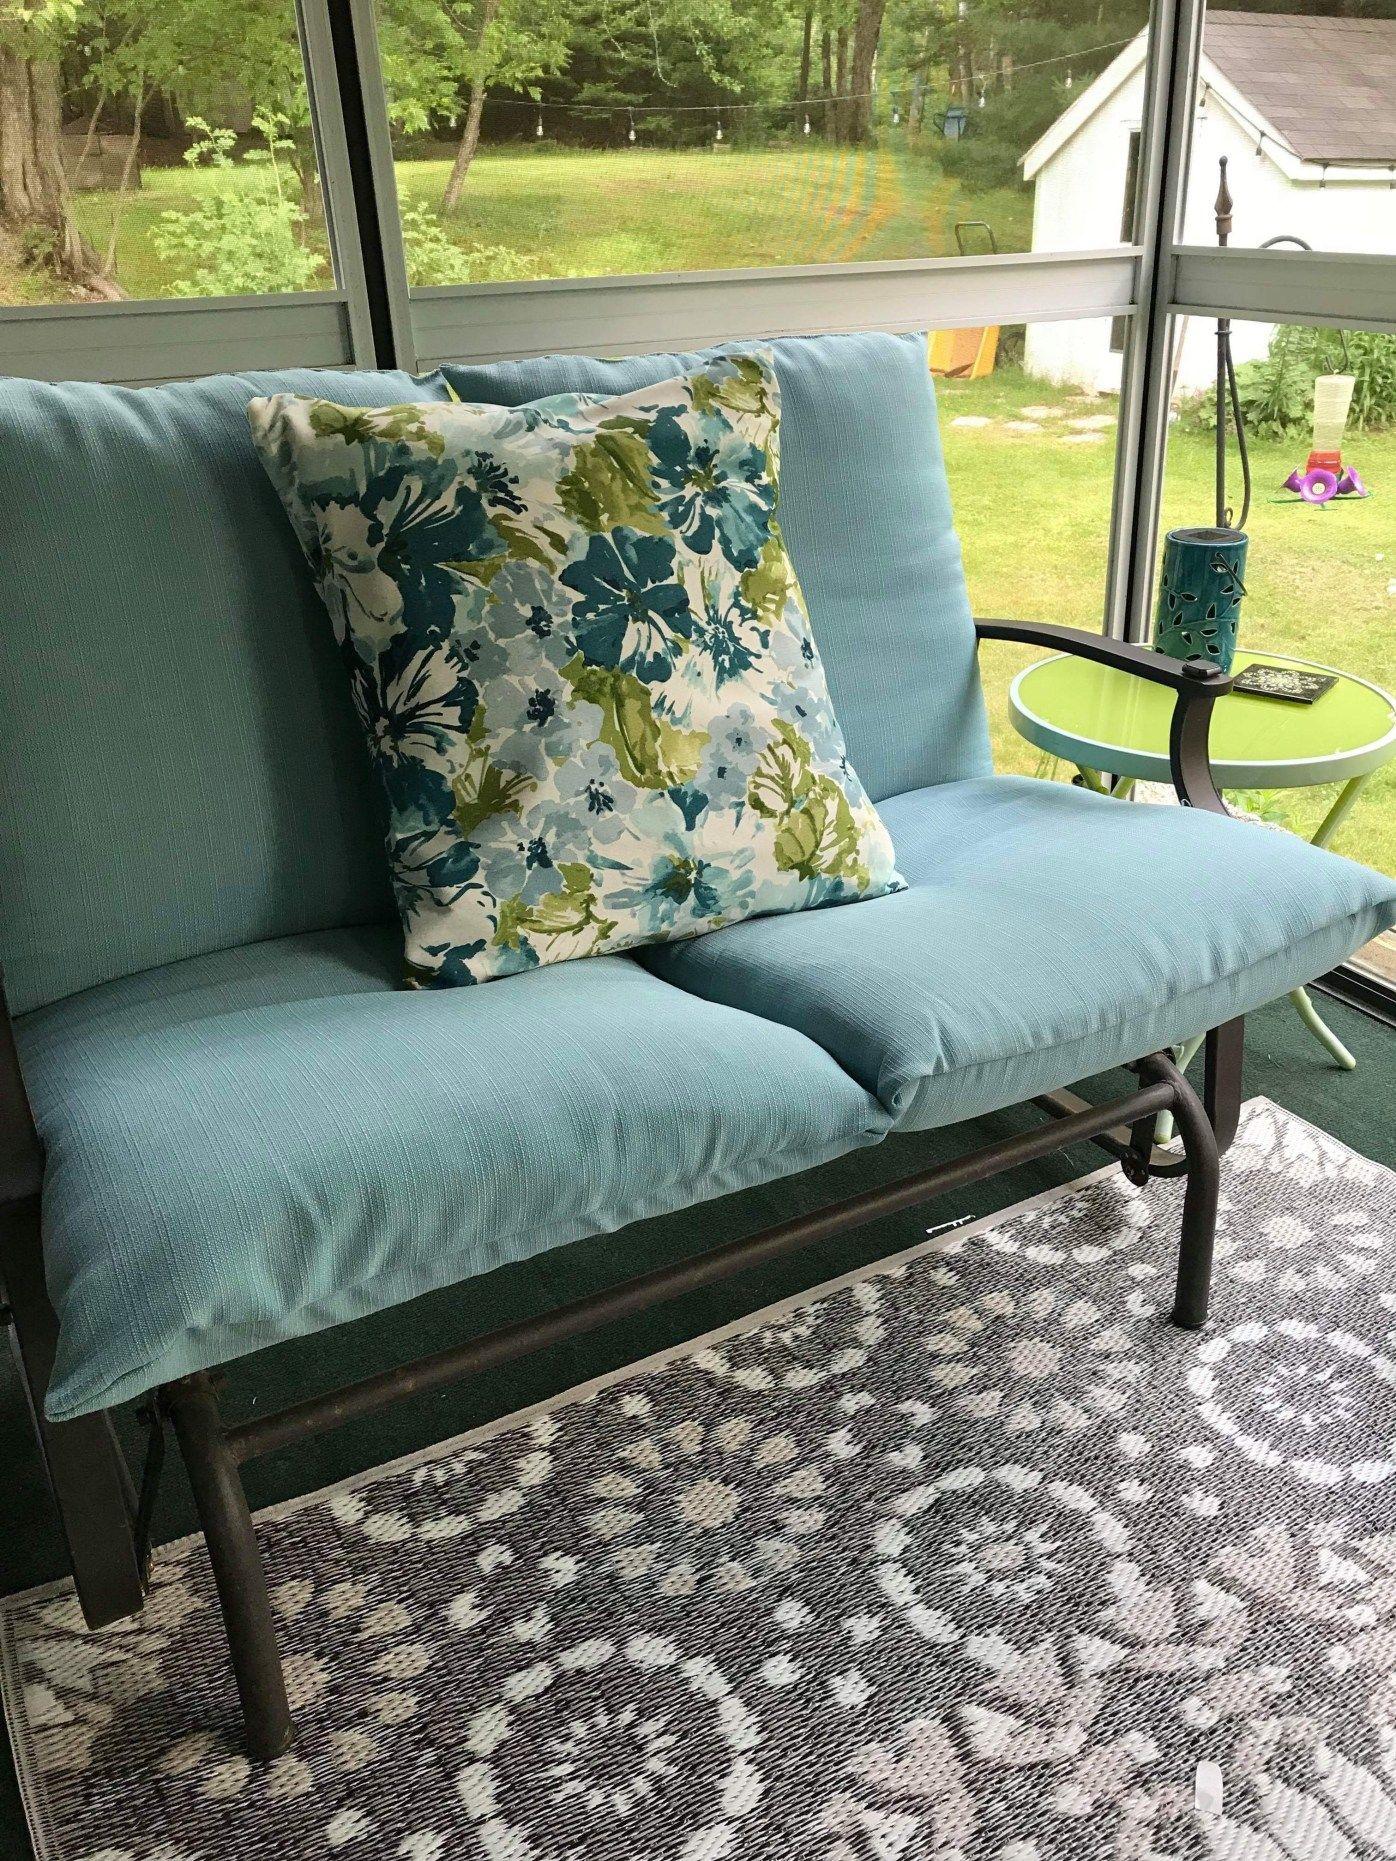 Diy patio cushion covers patio cushions diy patio